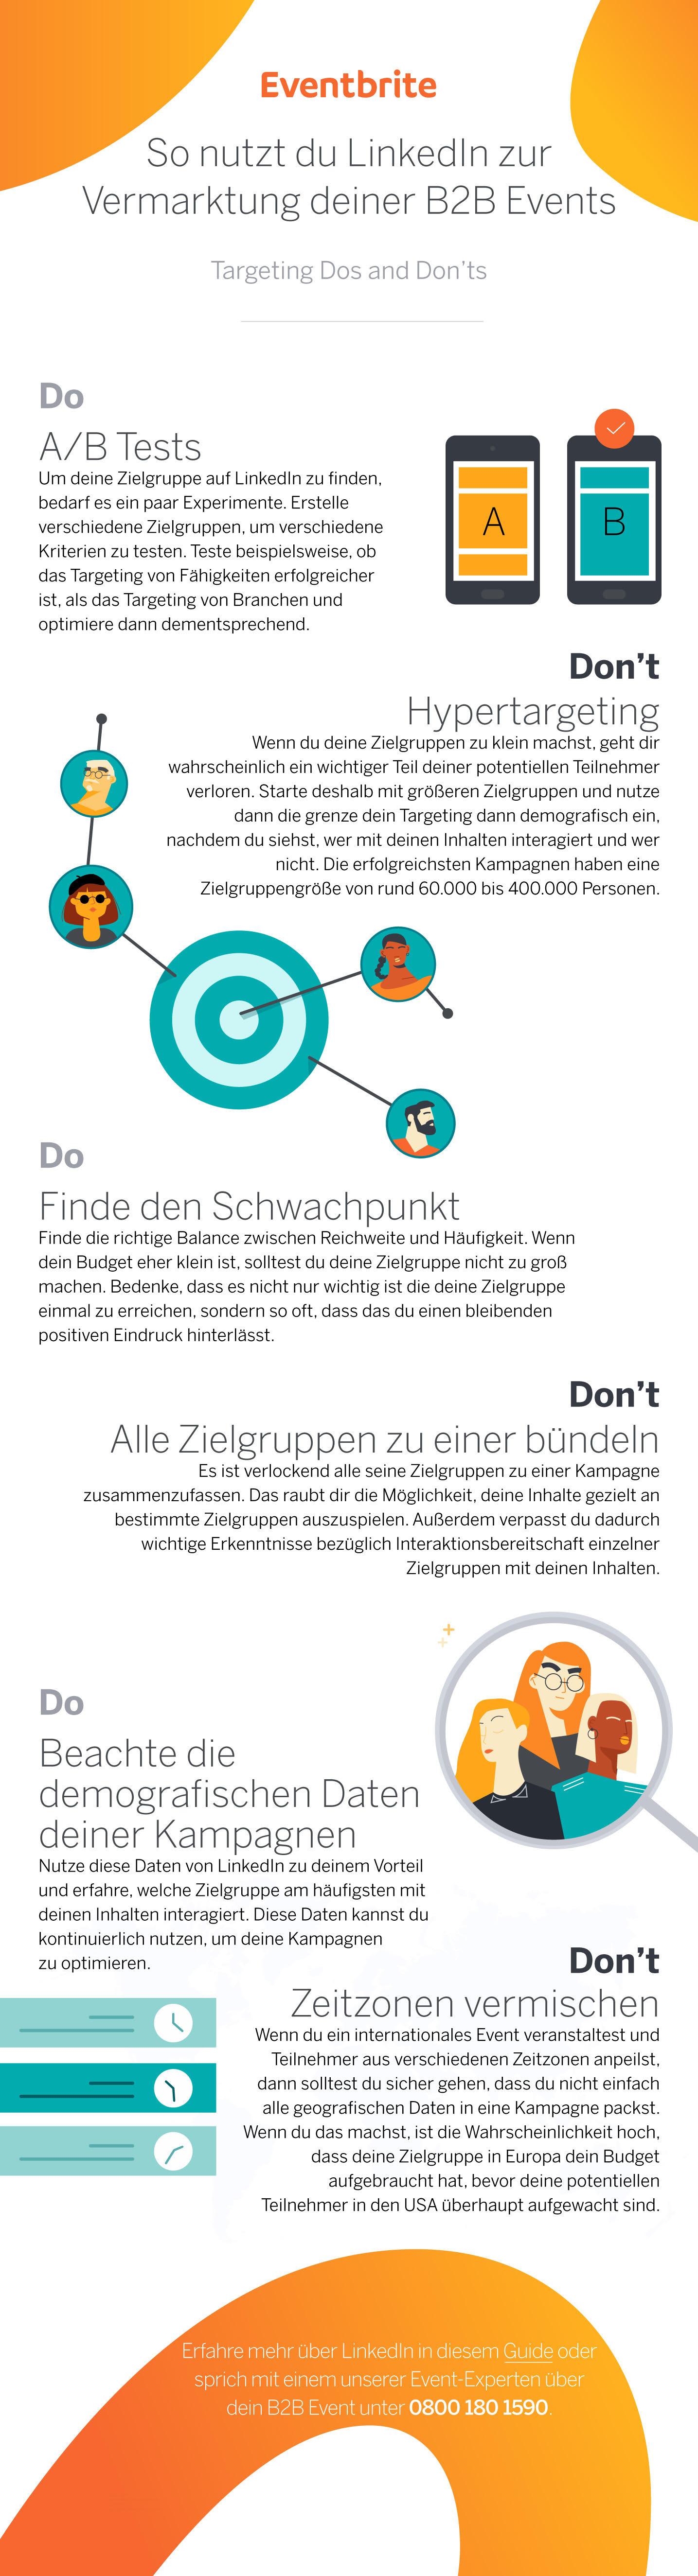 LinkedIn Targeting für B2B Events Eventbrite DE